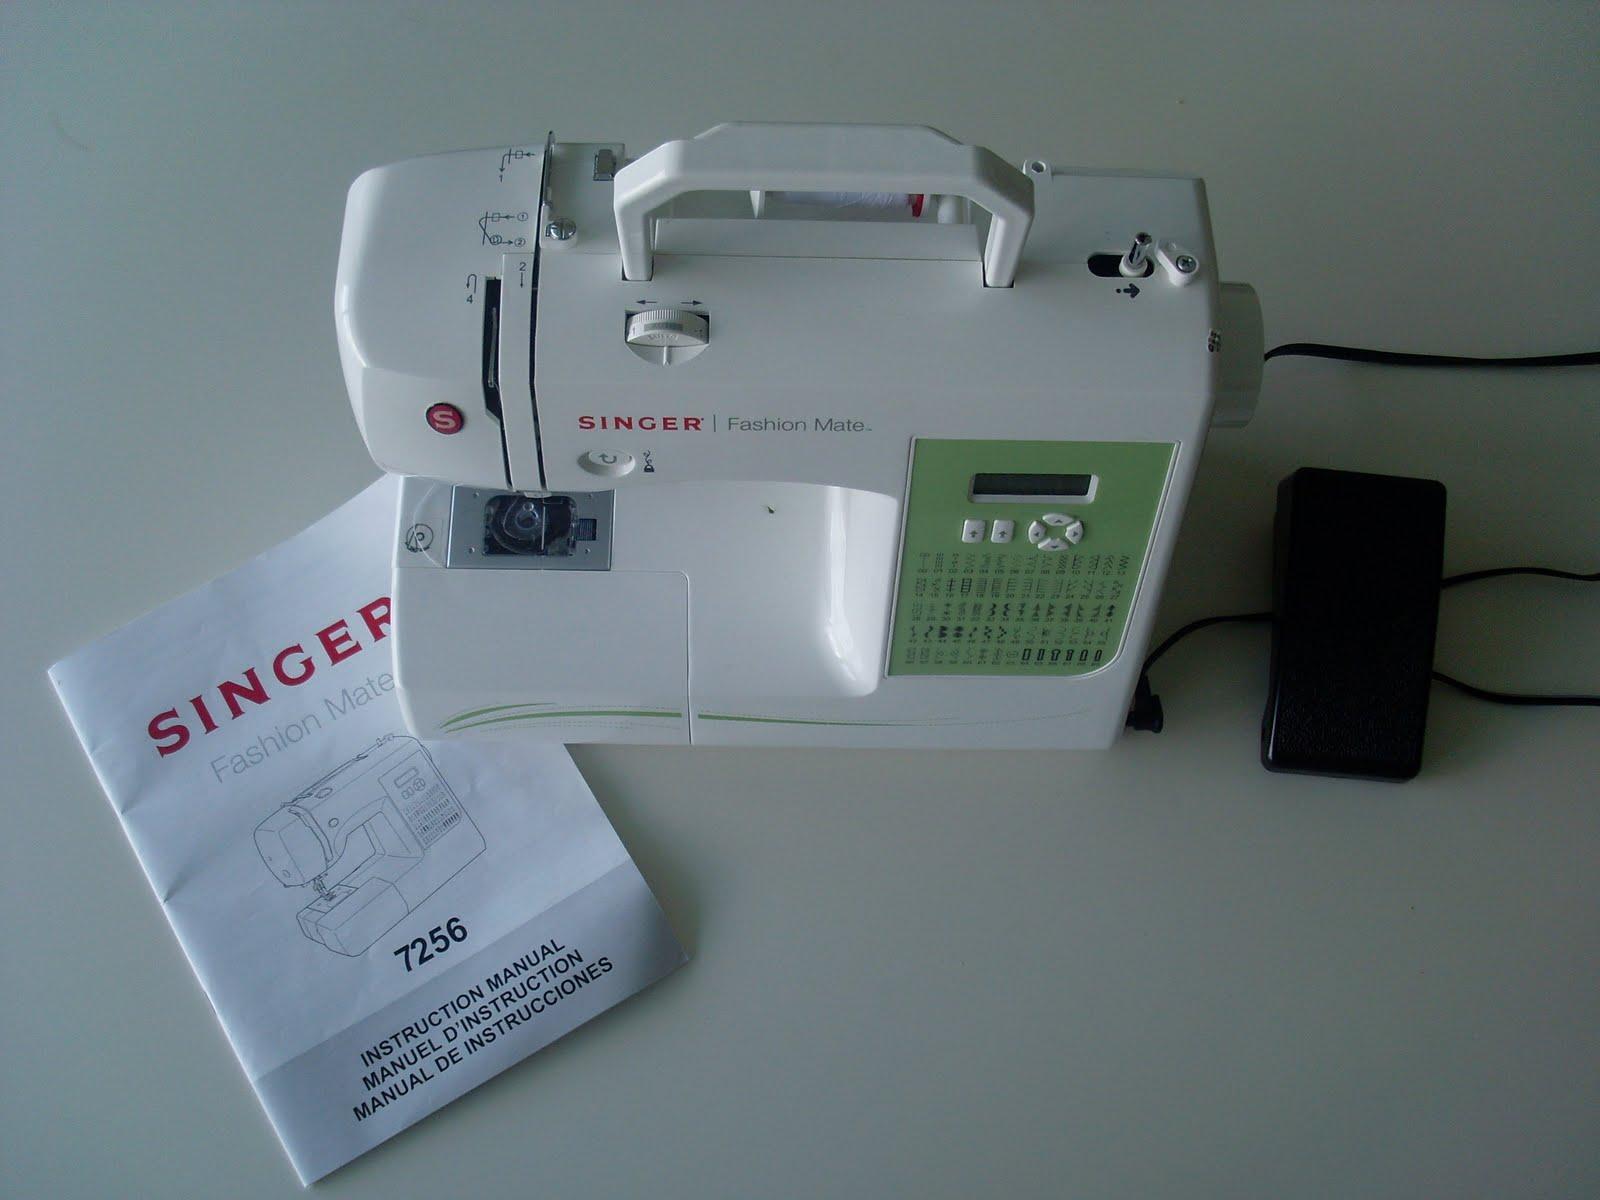 quality design b14cc db089 Singer sewing machine fashion mate 252